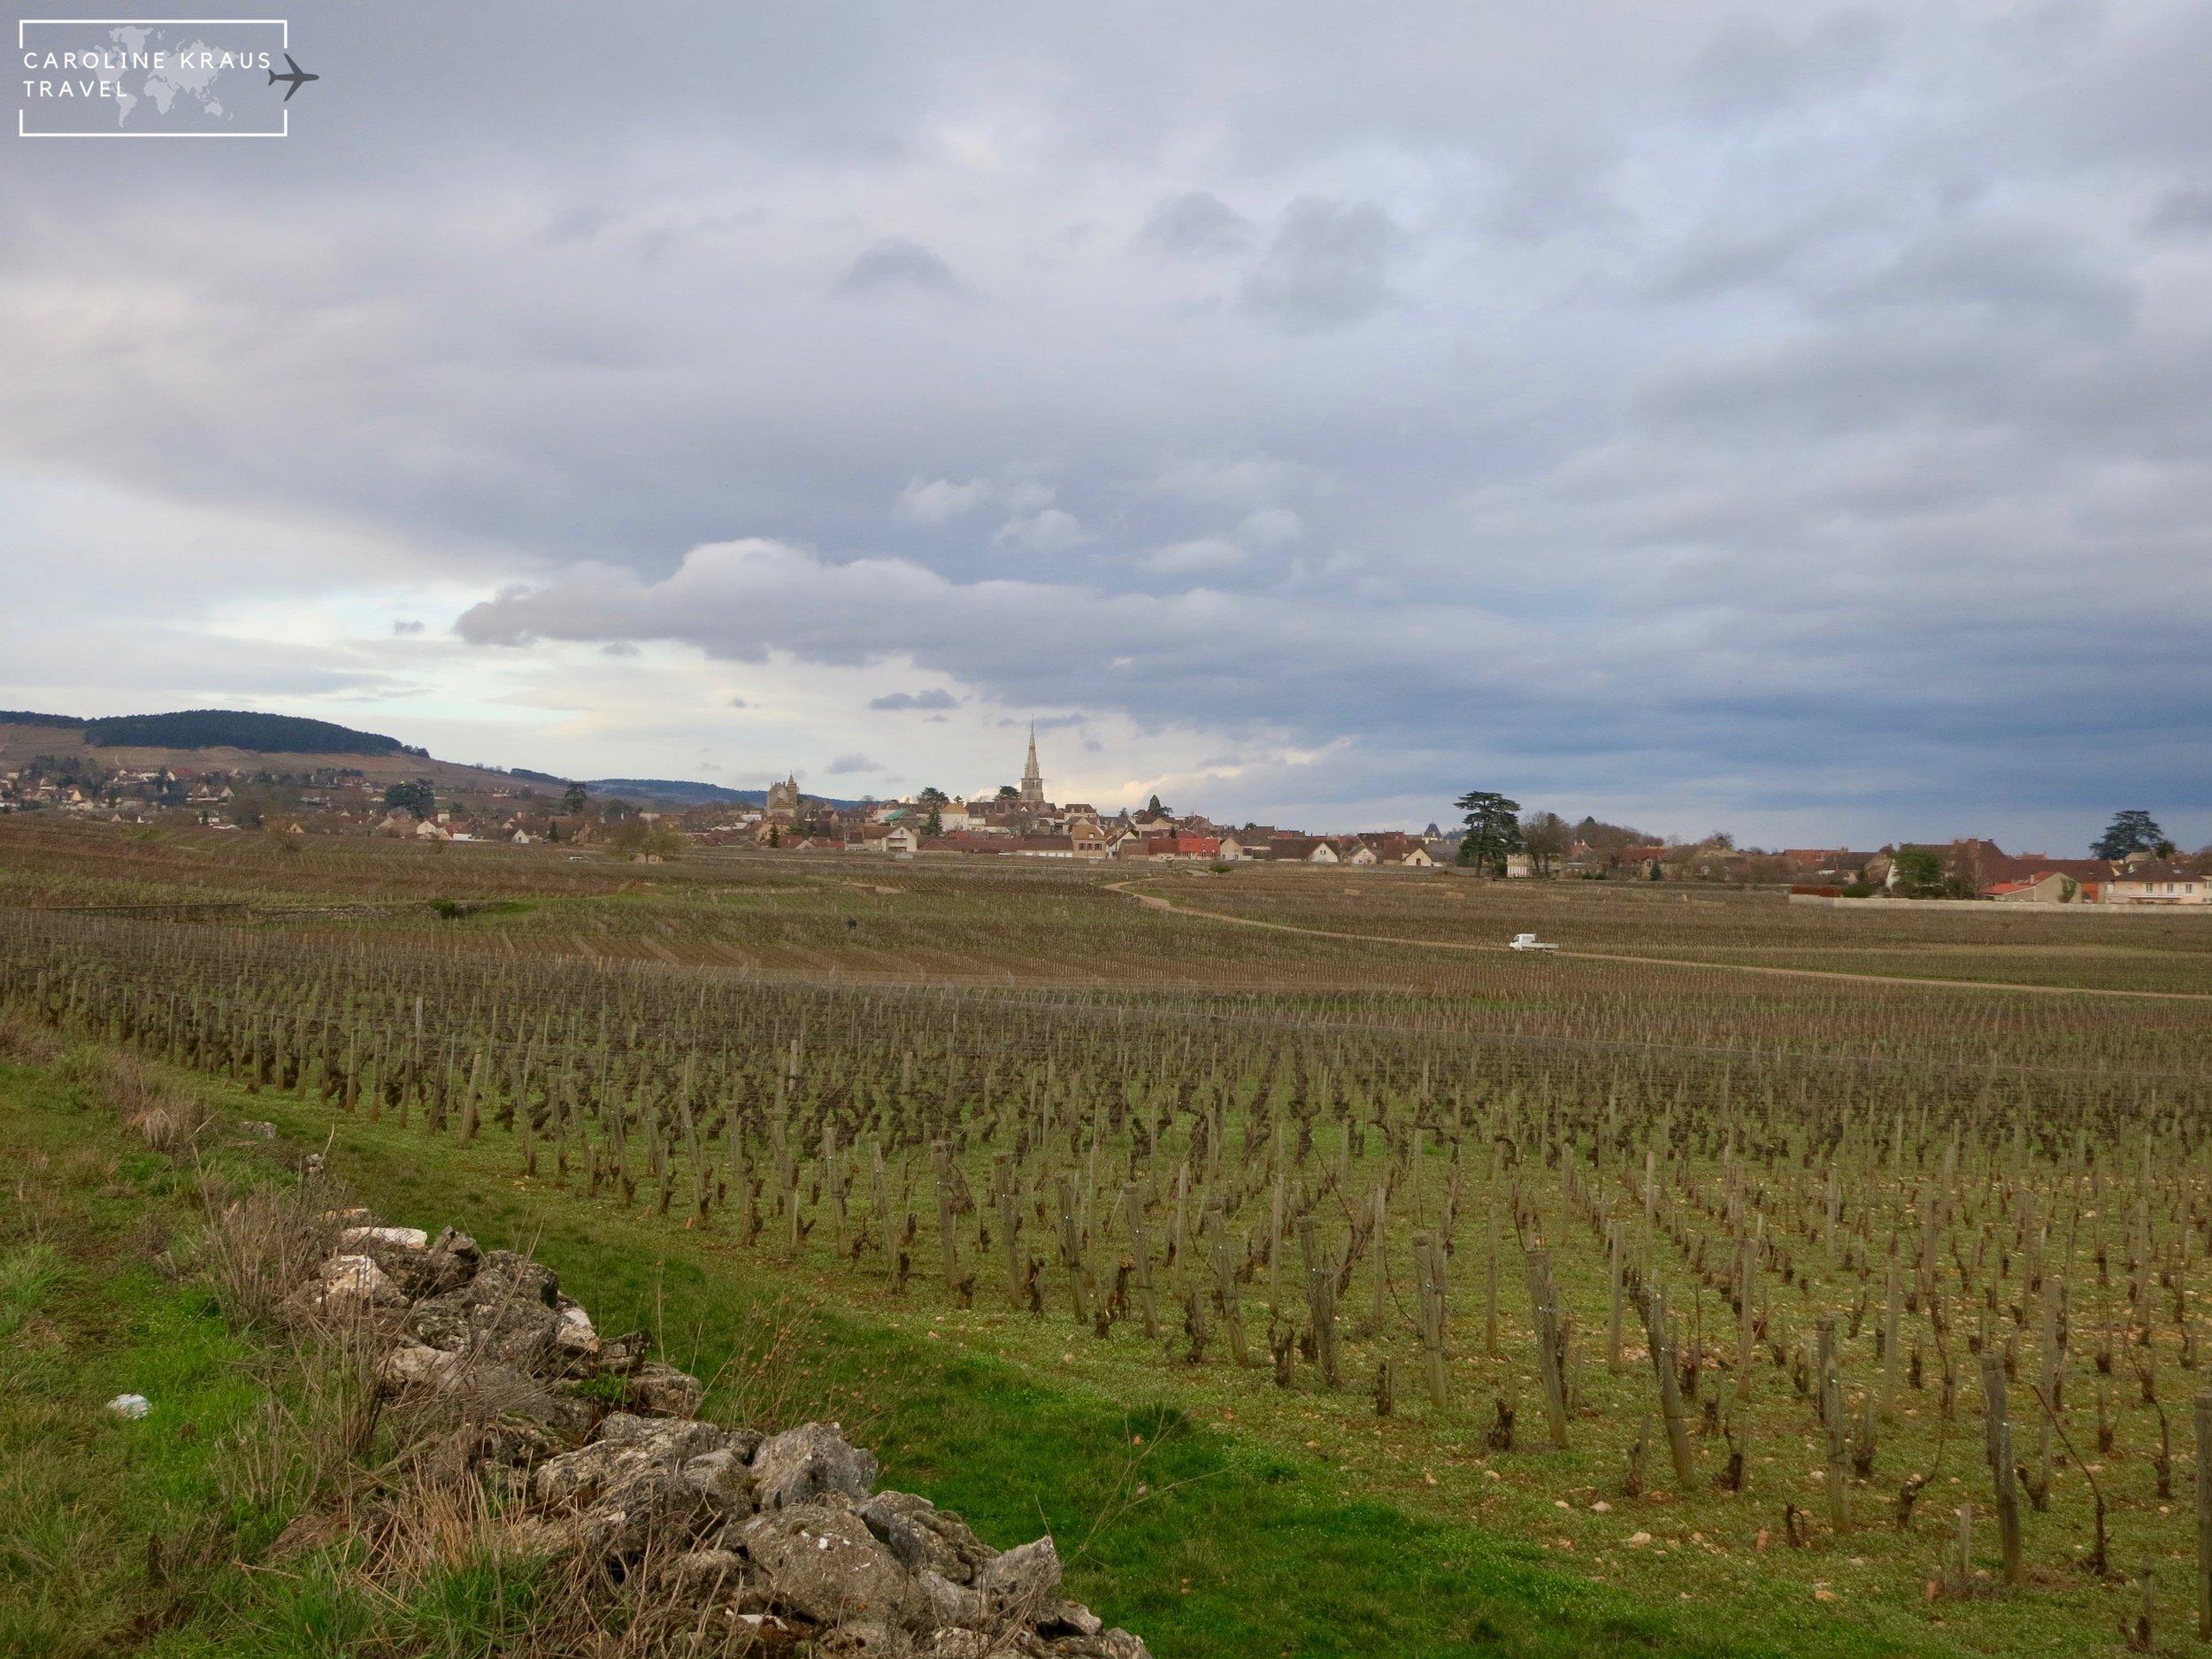 The village of Meursault